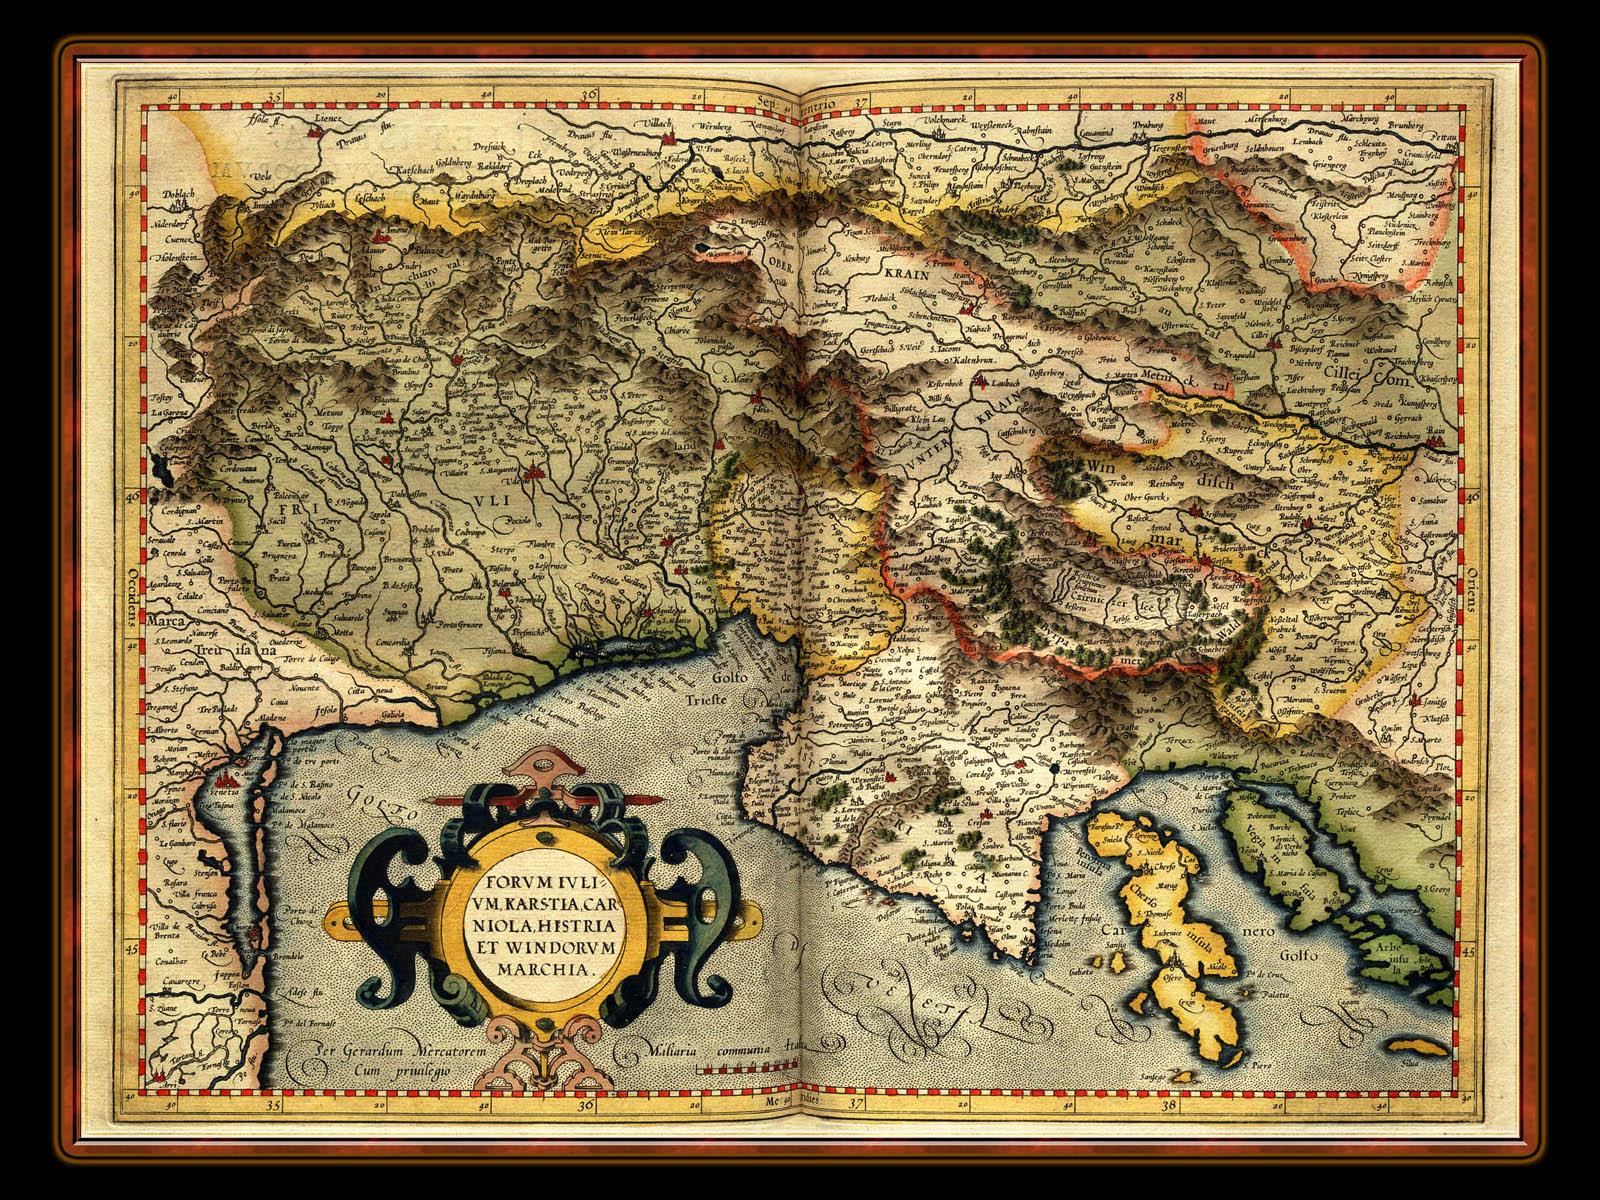 Wallpaper Maza antique map wallpaper 1600x1200